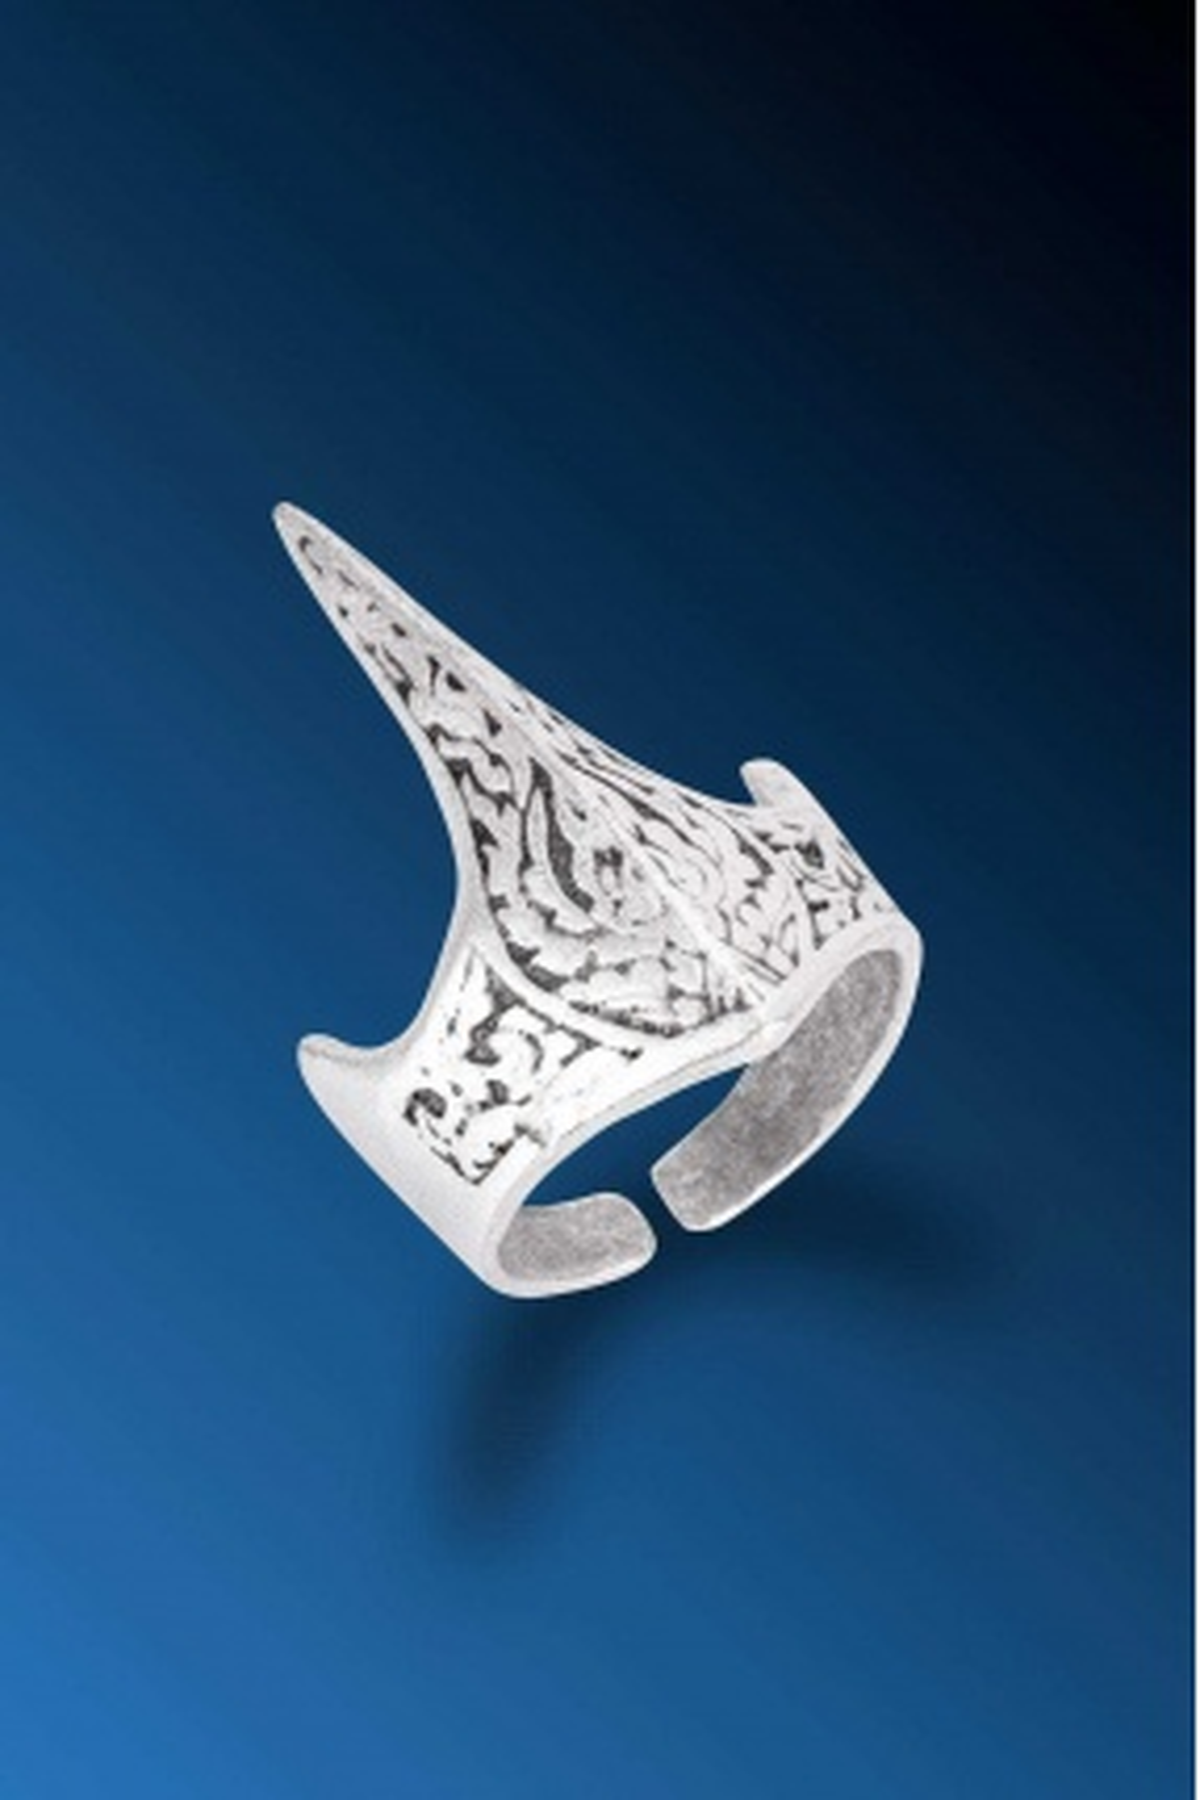 Zihgir Baş Parmak Okçu Yüzüğü - YÜZ0032